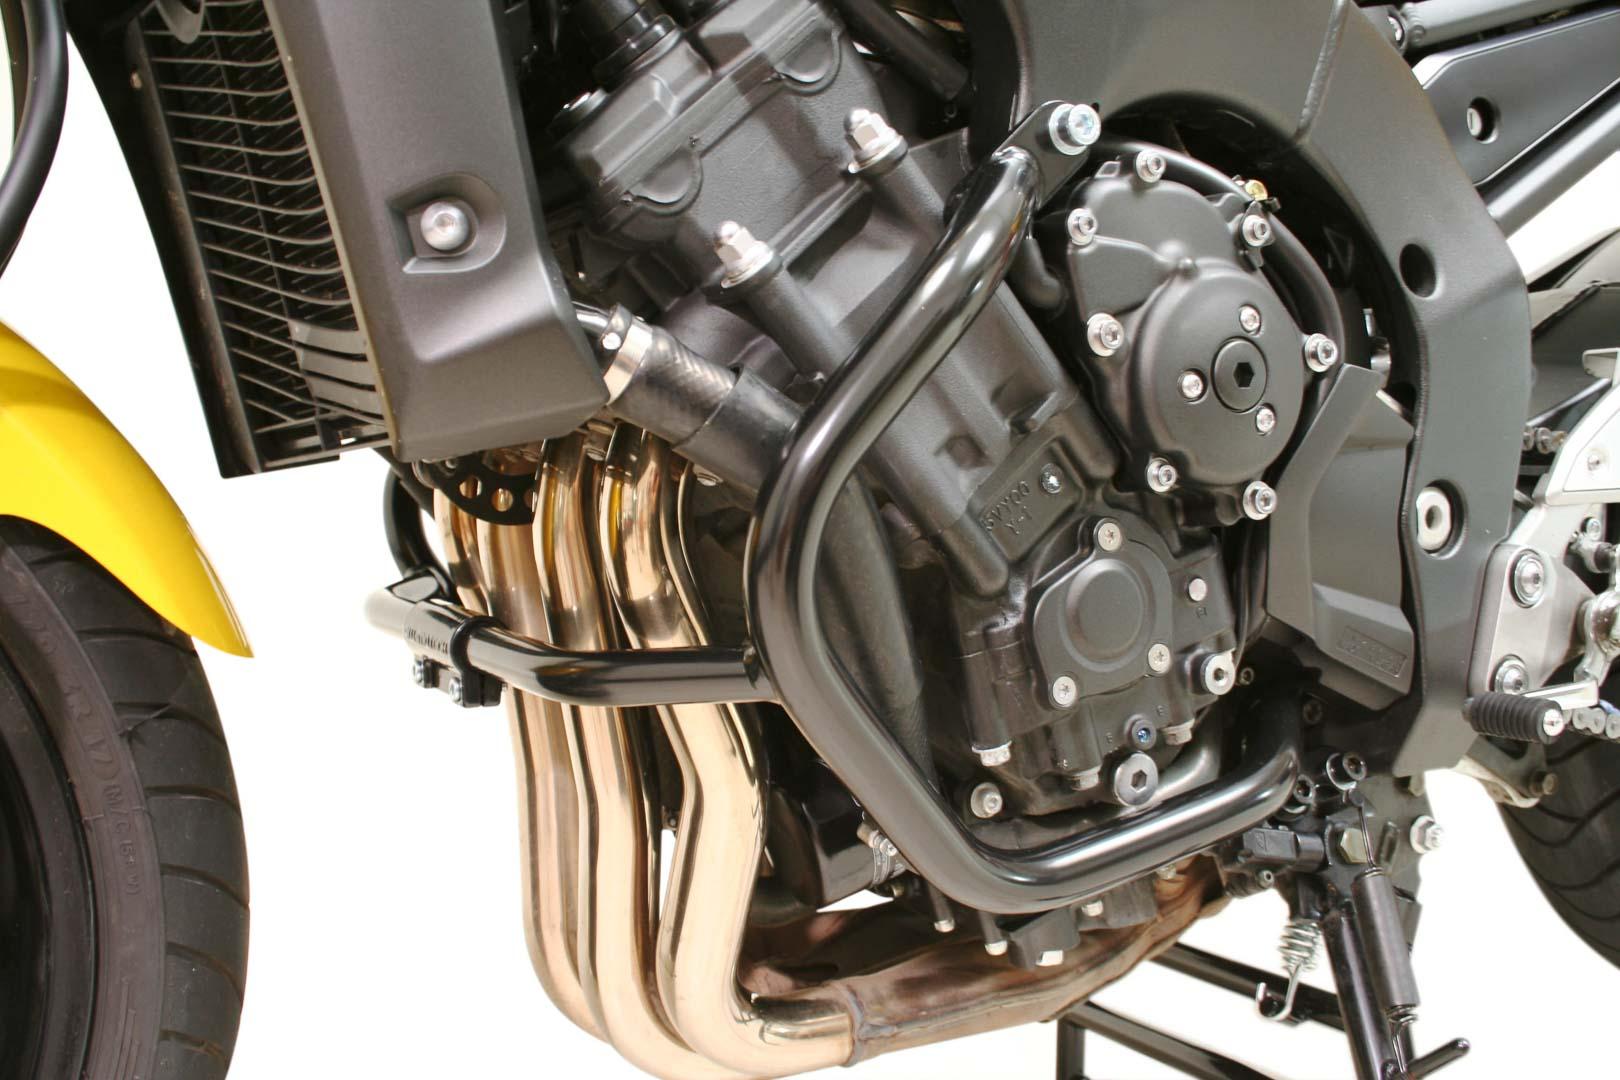 SW-Motech Moottorinsuojarauta Yamaha FZ1/Fazer musta